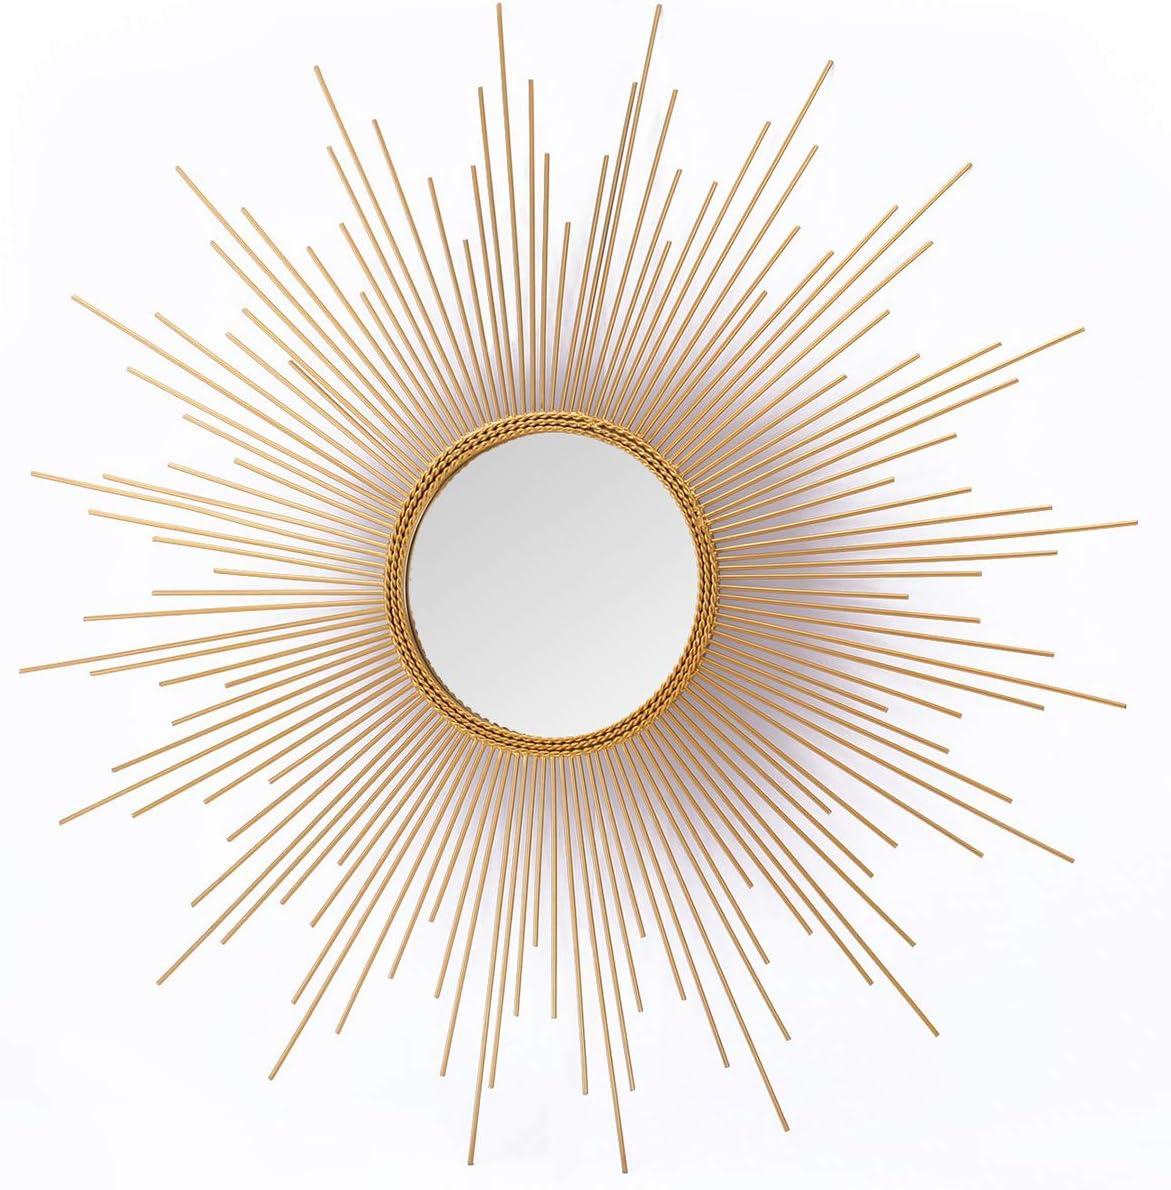 Asense Home Collection Sunburst Mirror, Classic Metal Decorative Wall Mirror (Sunburst Gold)